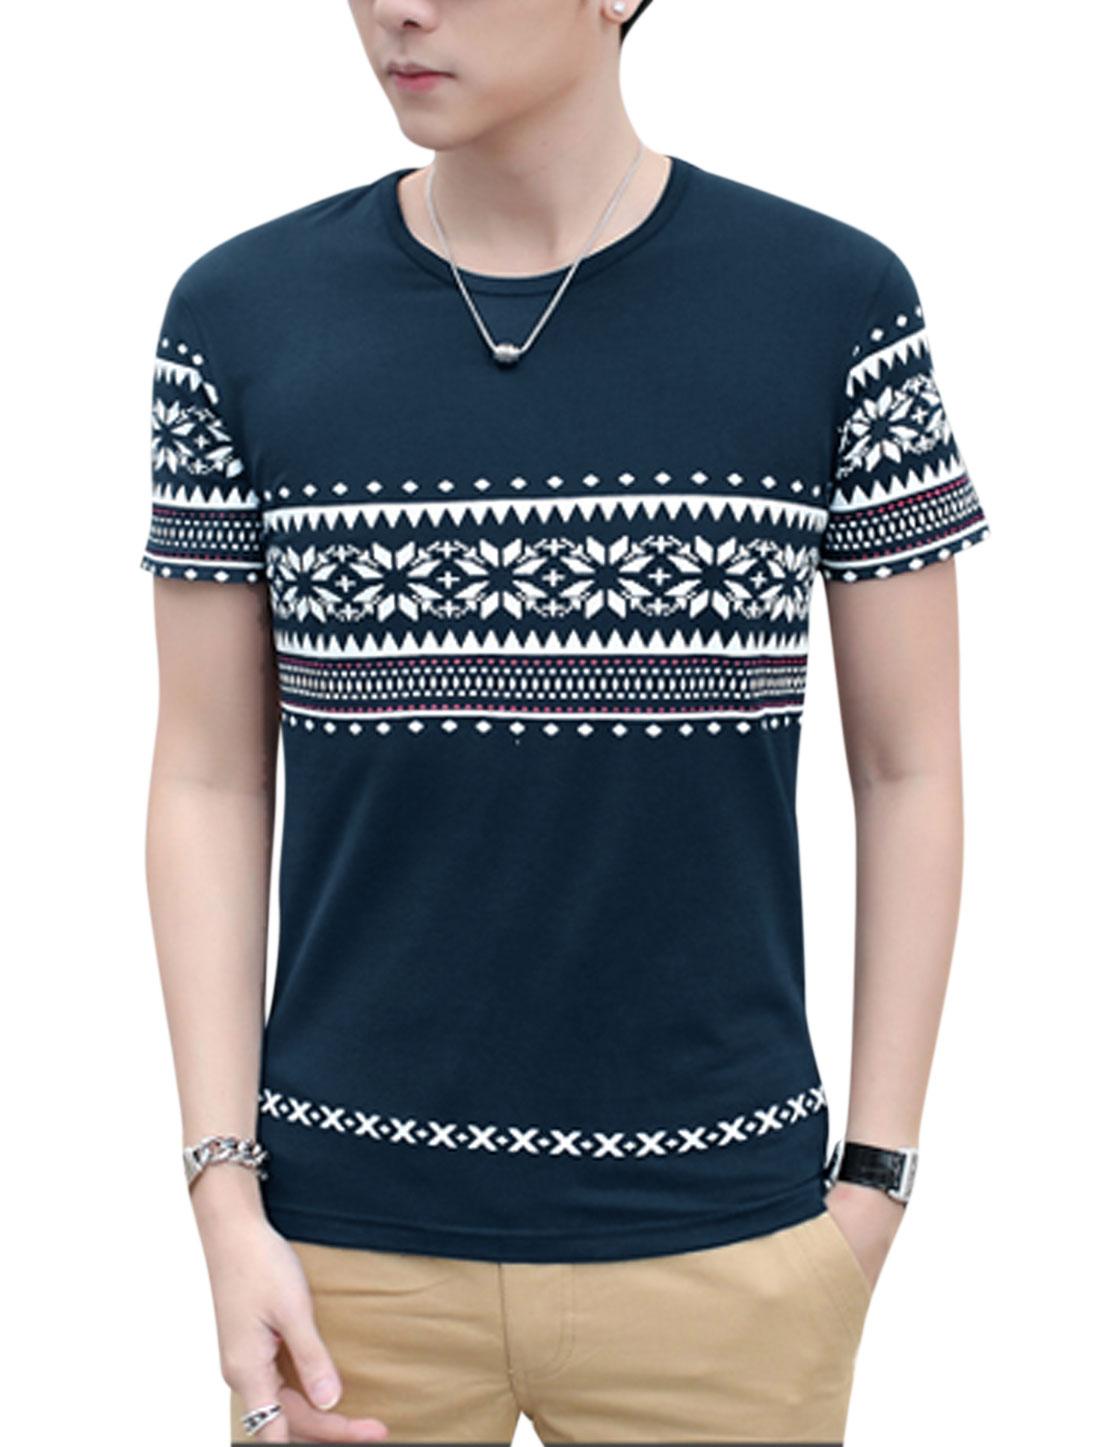 Men Geometric Snowflake Print Short Sleeve Casual T Shirts Navy Blue M